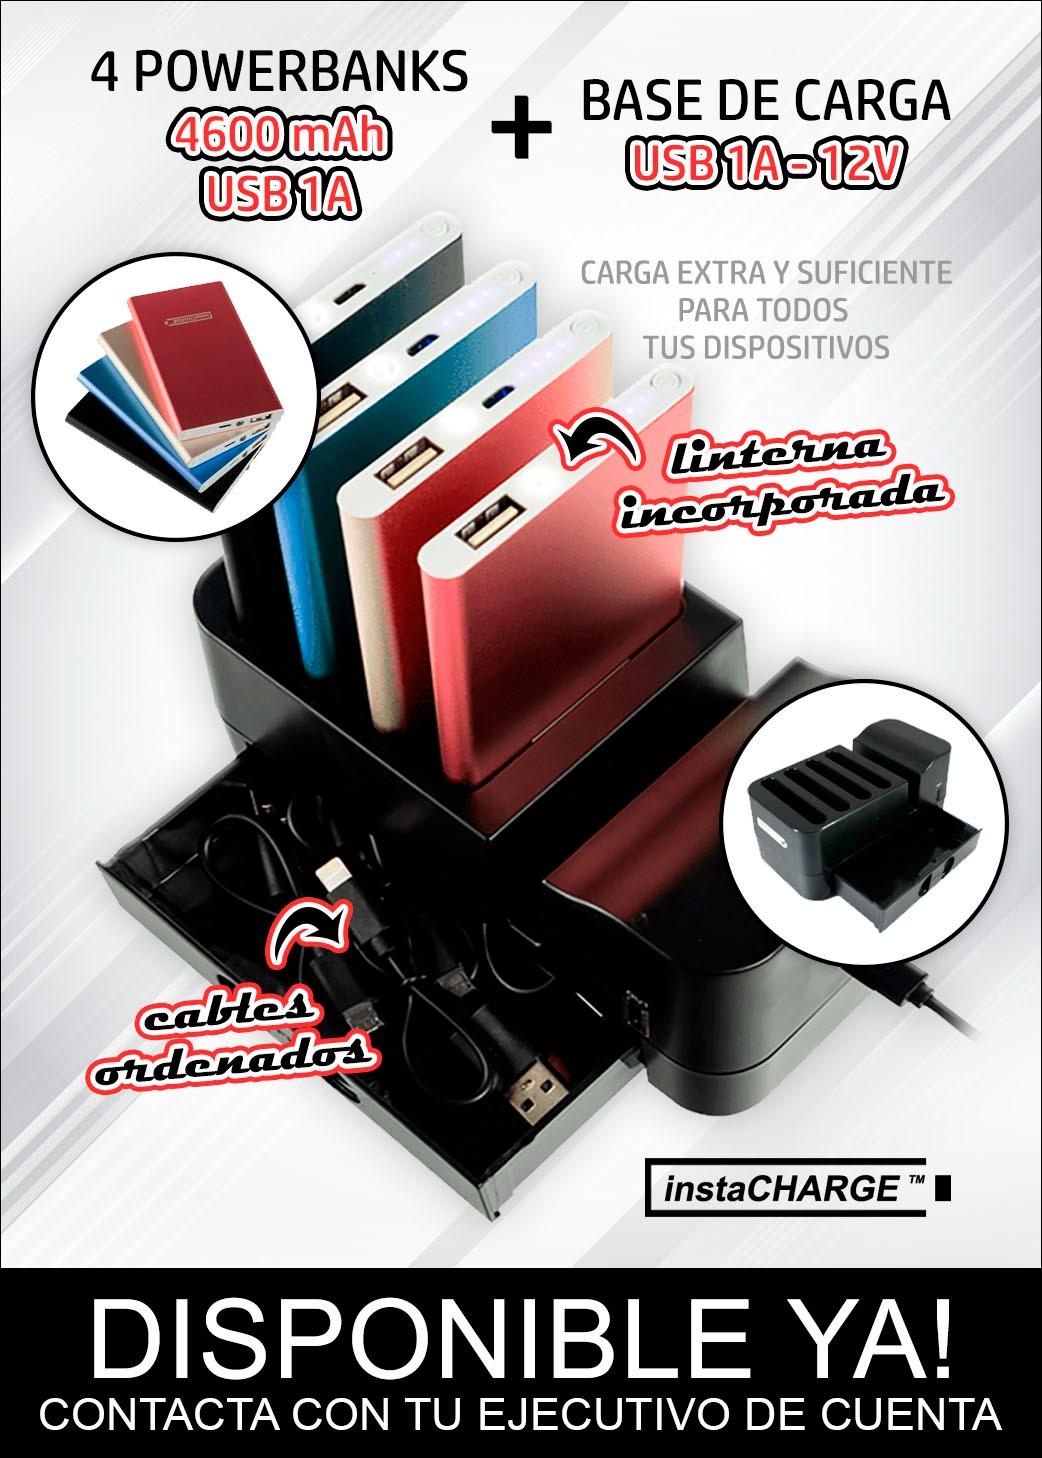 POWERBANKS + ESTACION CARGA